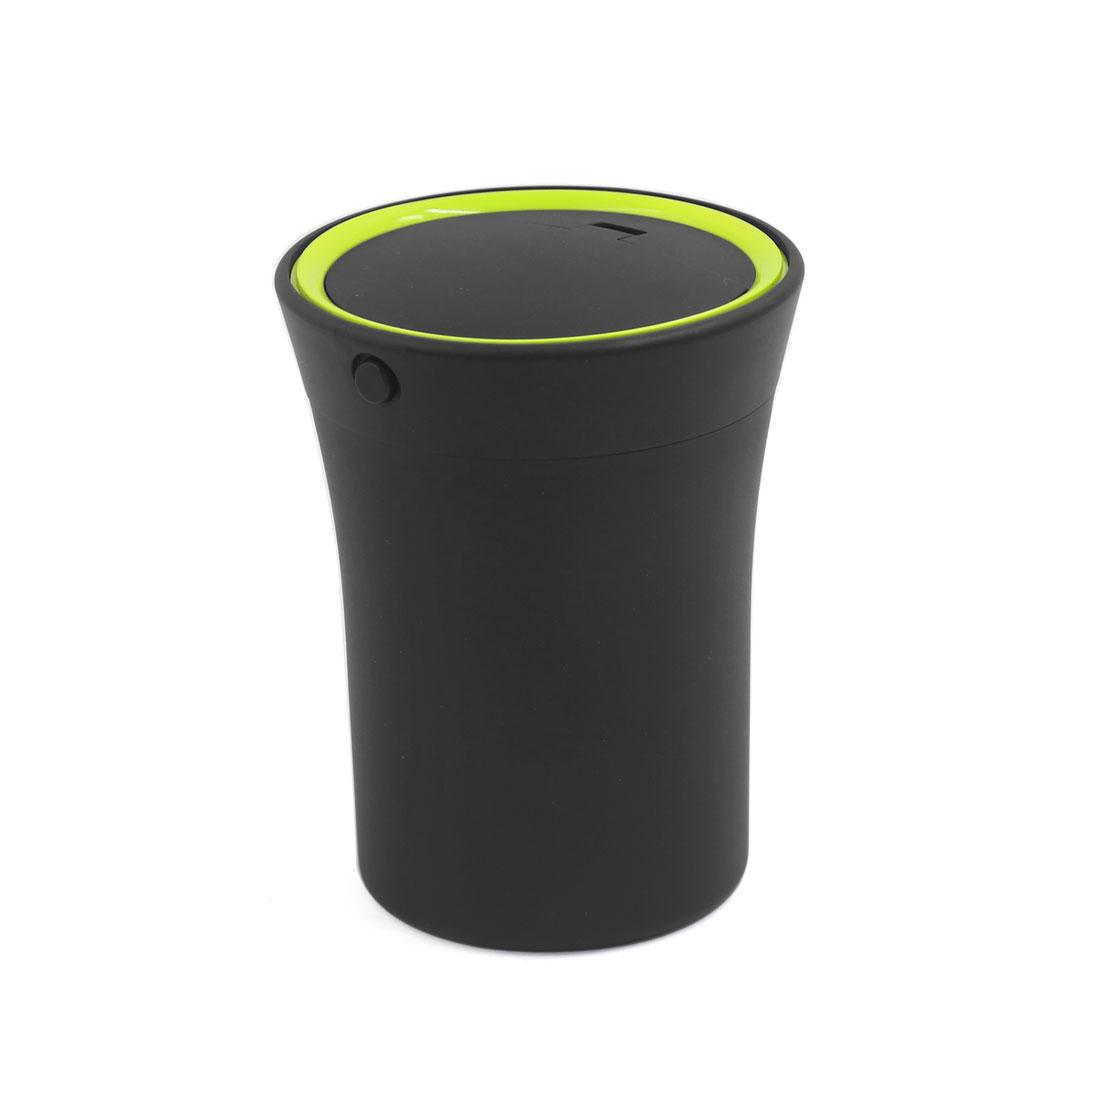 Portable Rechargeable Blue LED Light Ashtray Car Auto Cigarette Ash Holder Cup